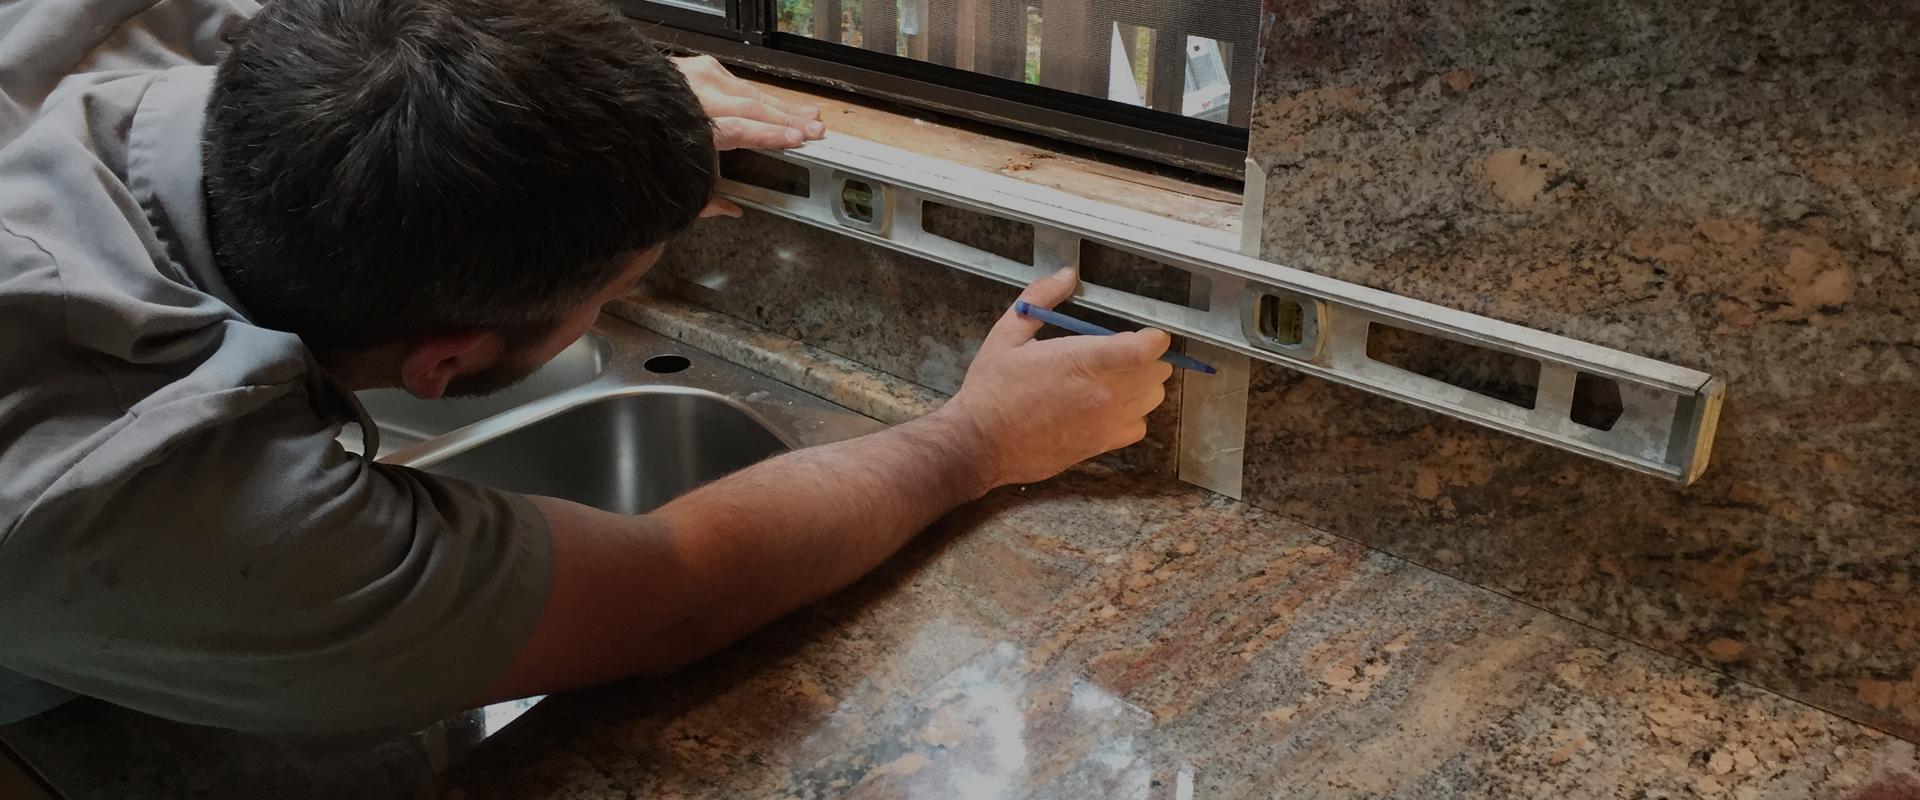 man meausring backsplash area behind sink